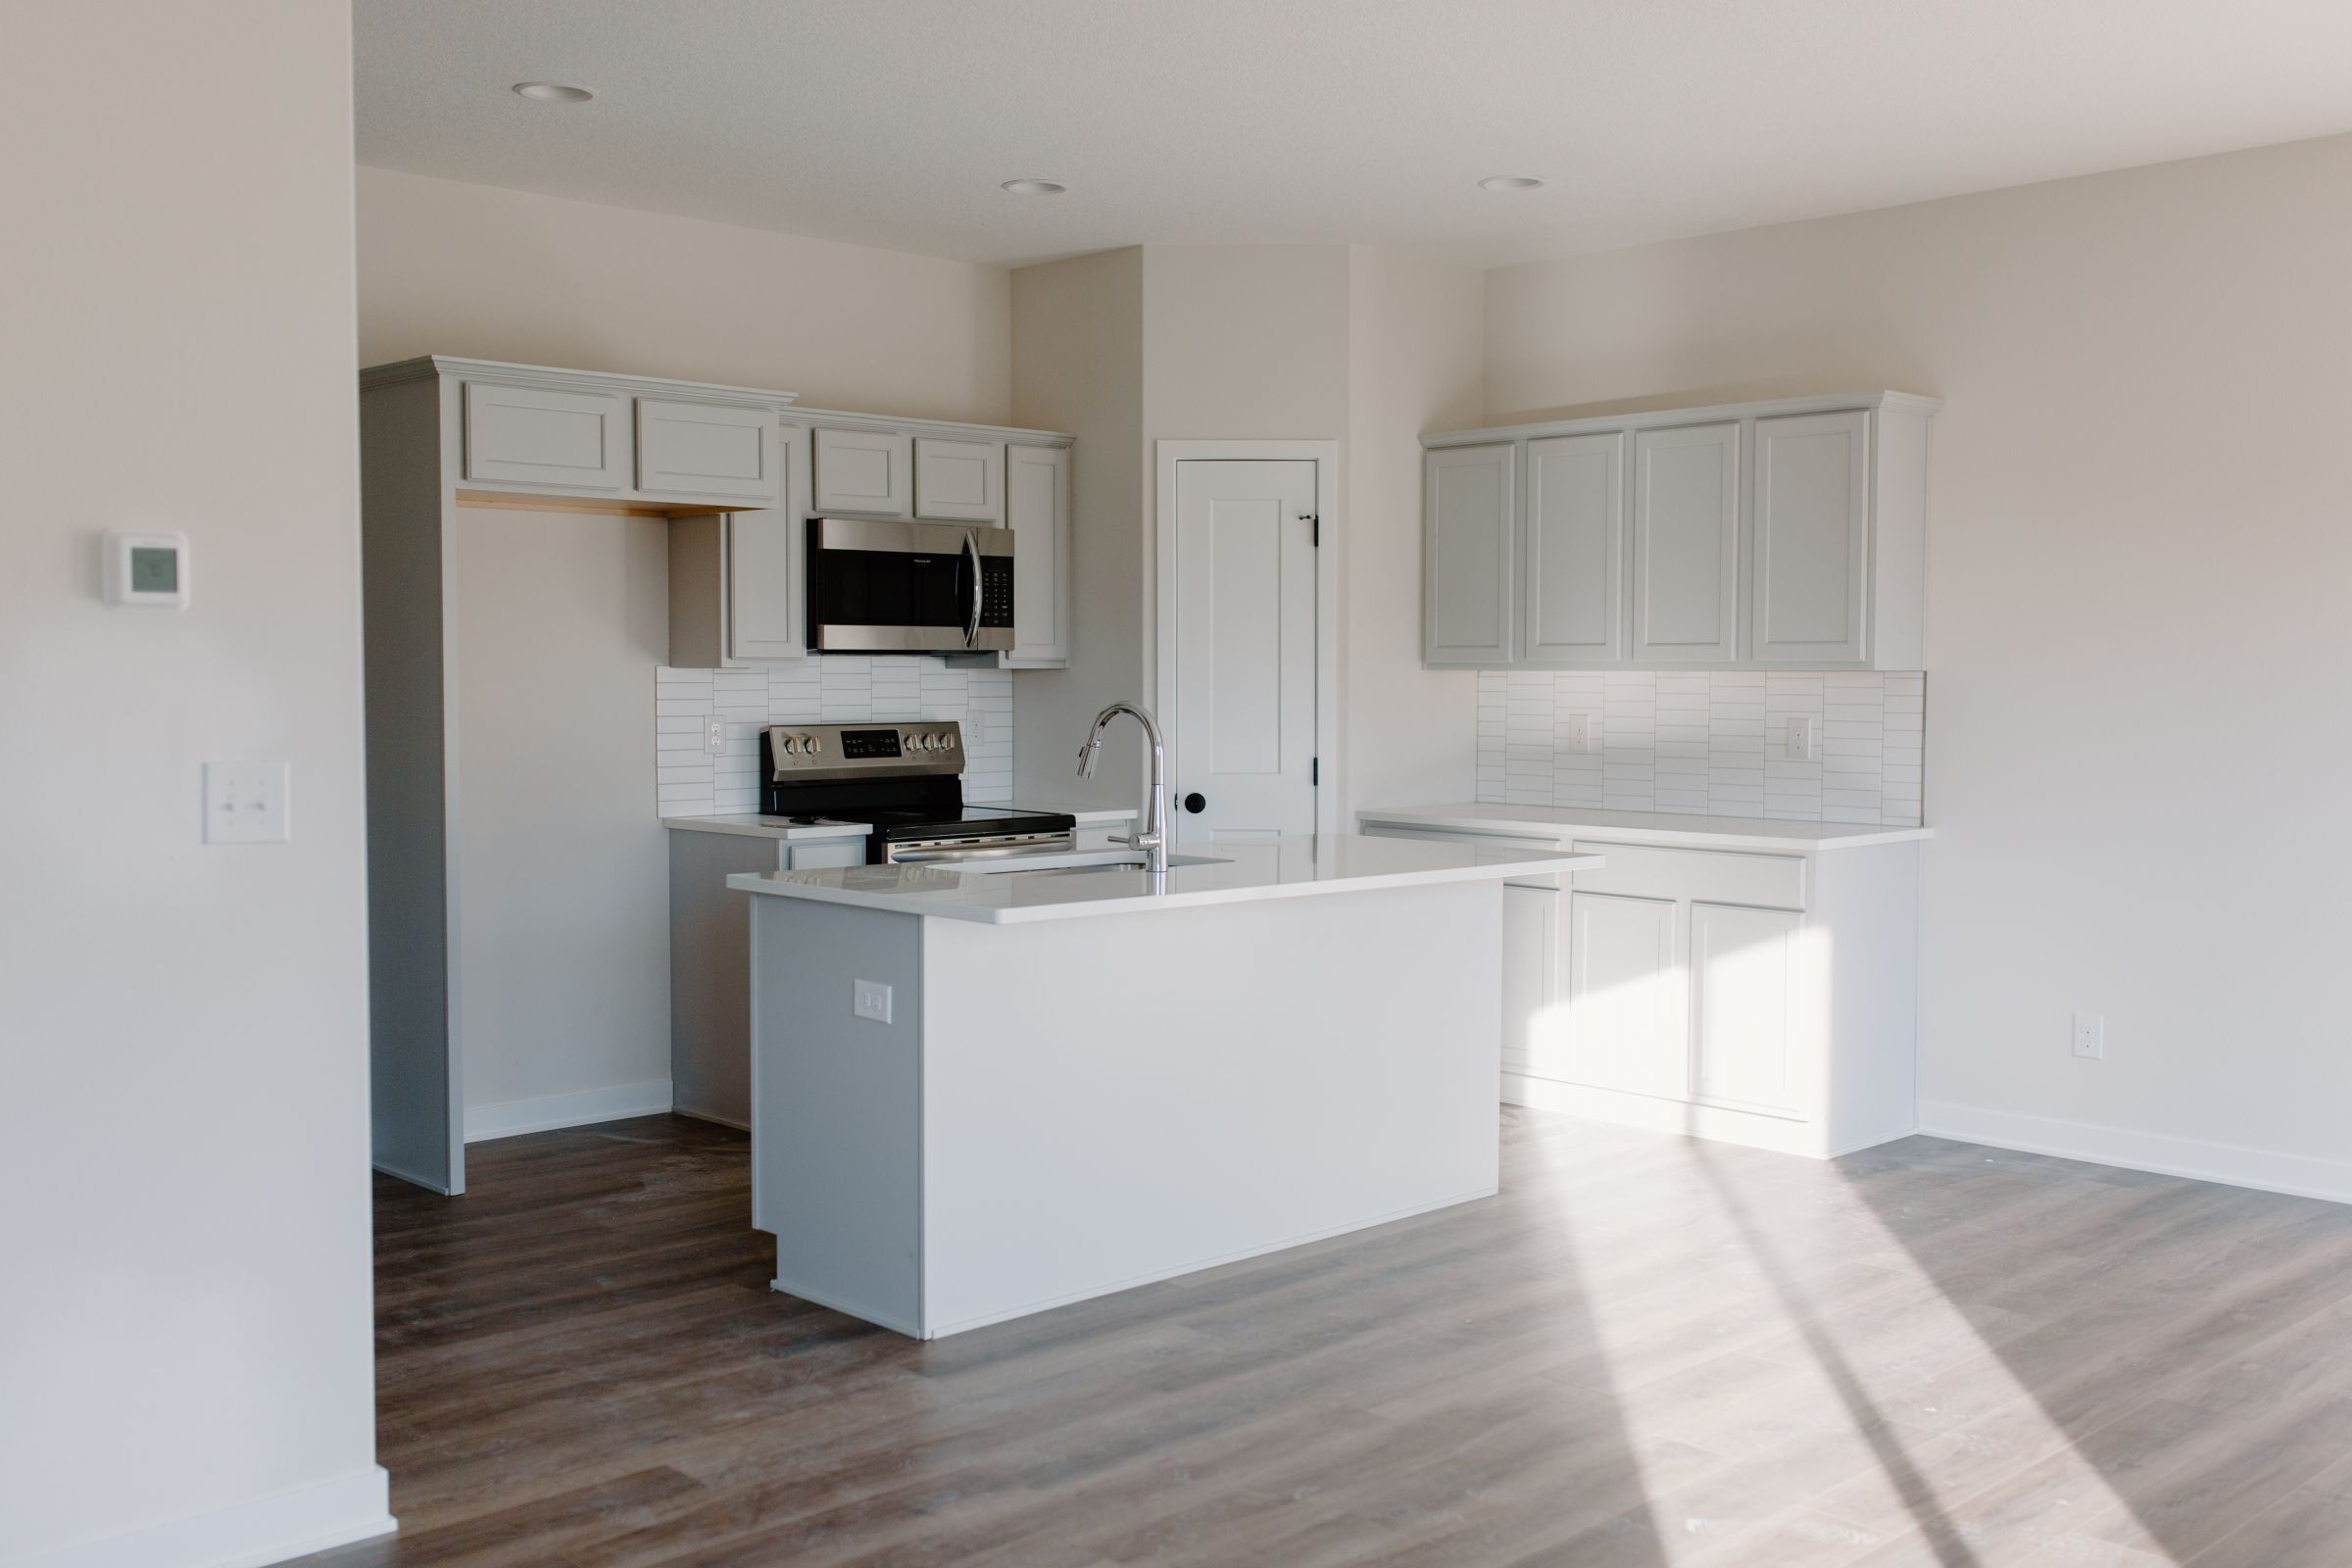 residential-warren-county-iowa-0-acres-listing-number-15366-1-2021-02-18-165309.jpg